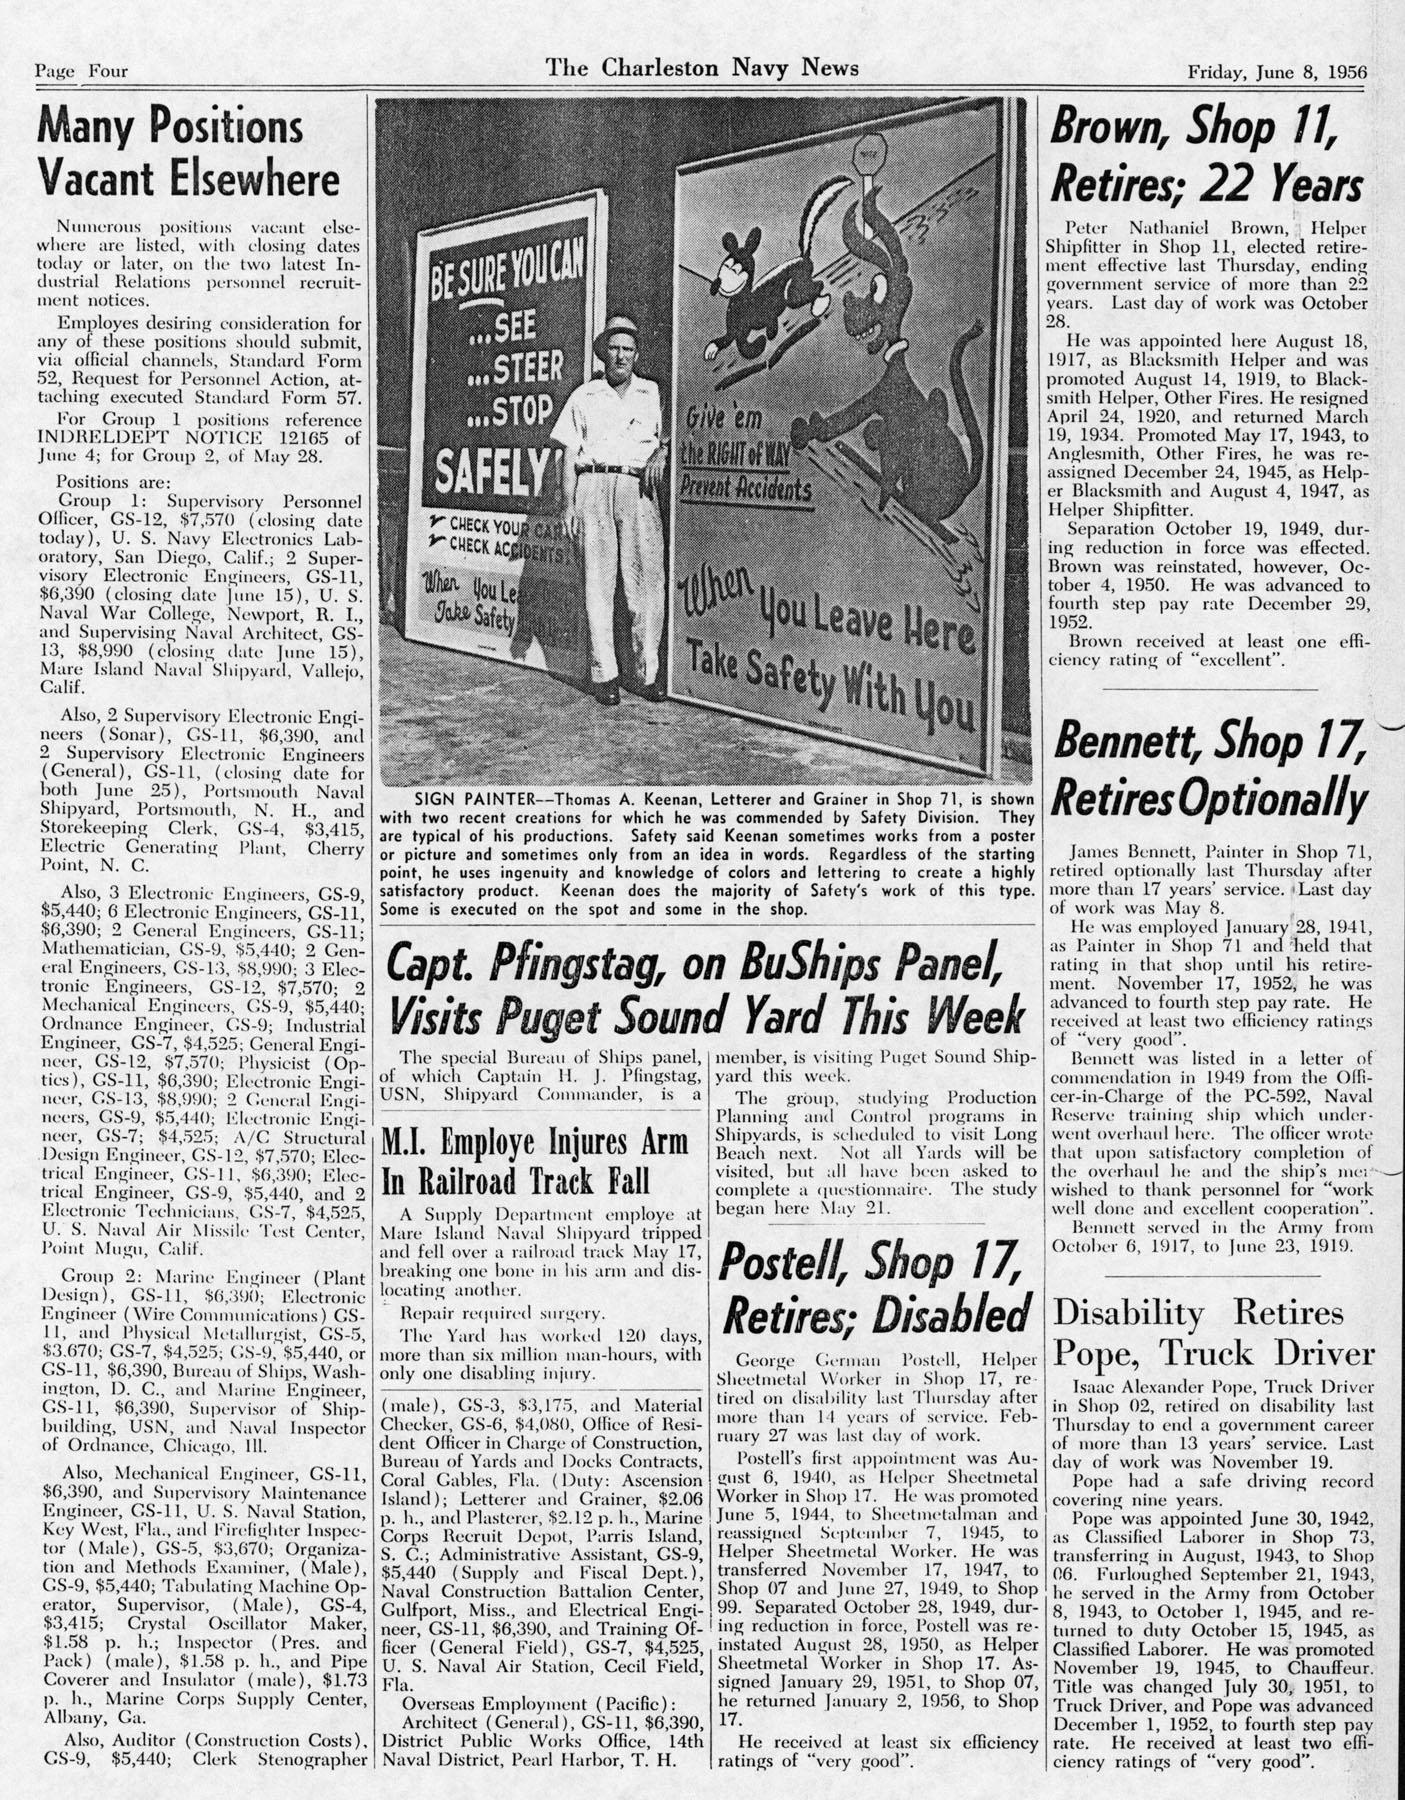 The Charleston Navy News, Volume 14, Edition 23, page iv